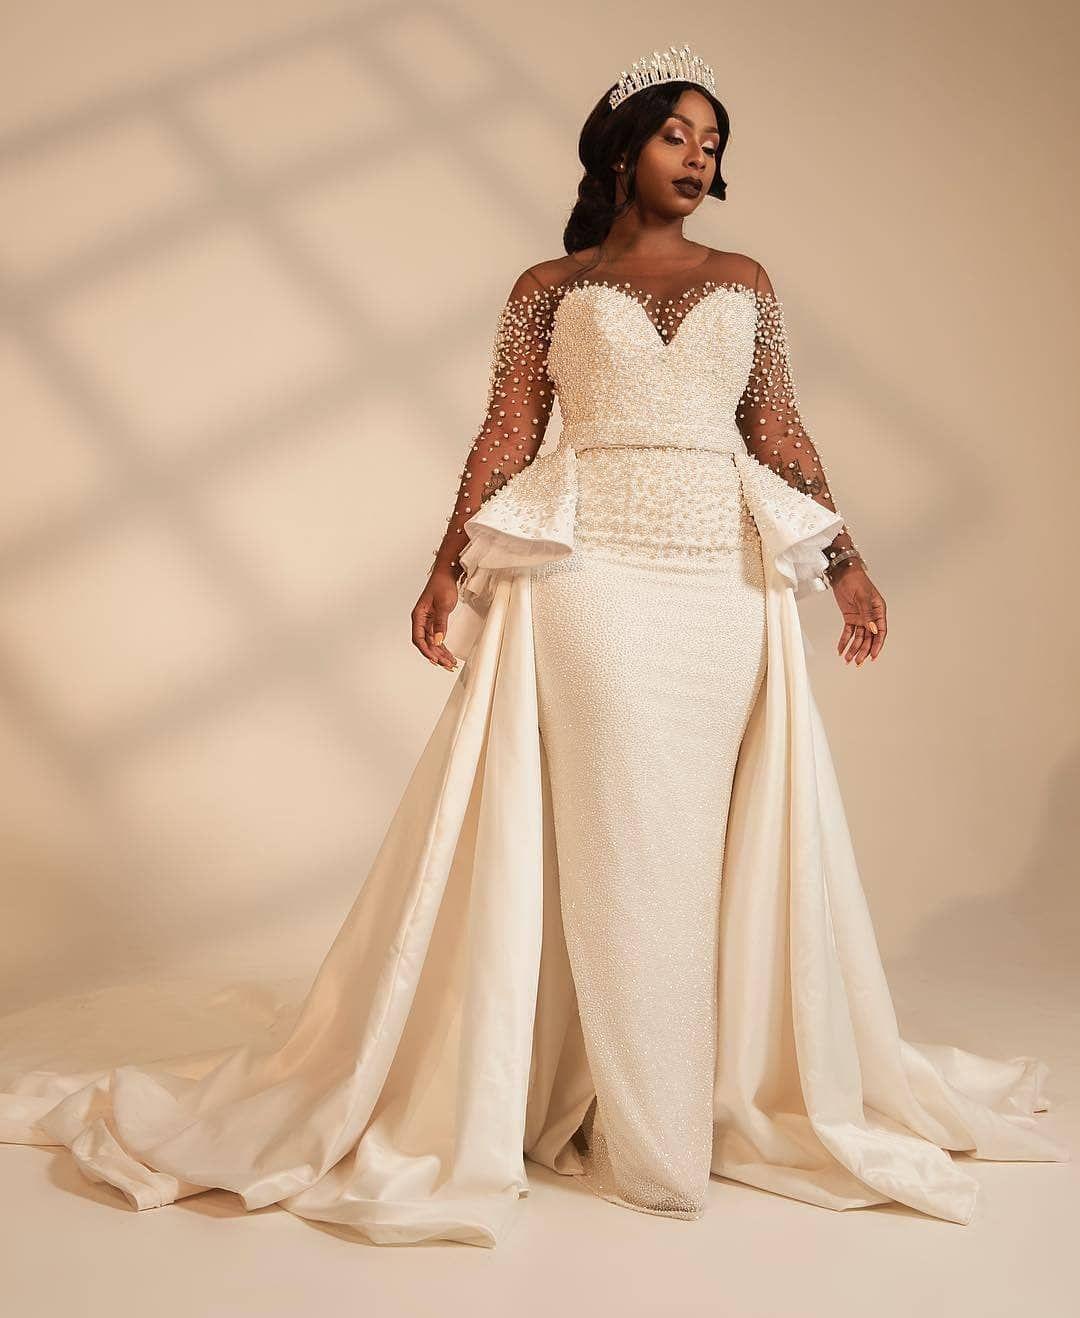 For That Stunning Reception Dress! Belle @boity Hair